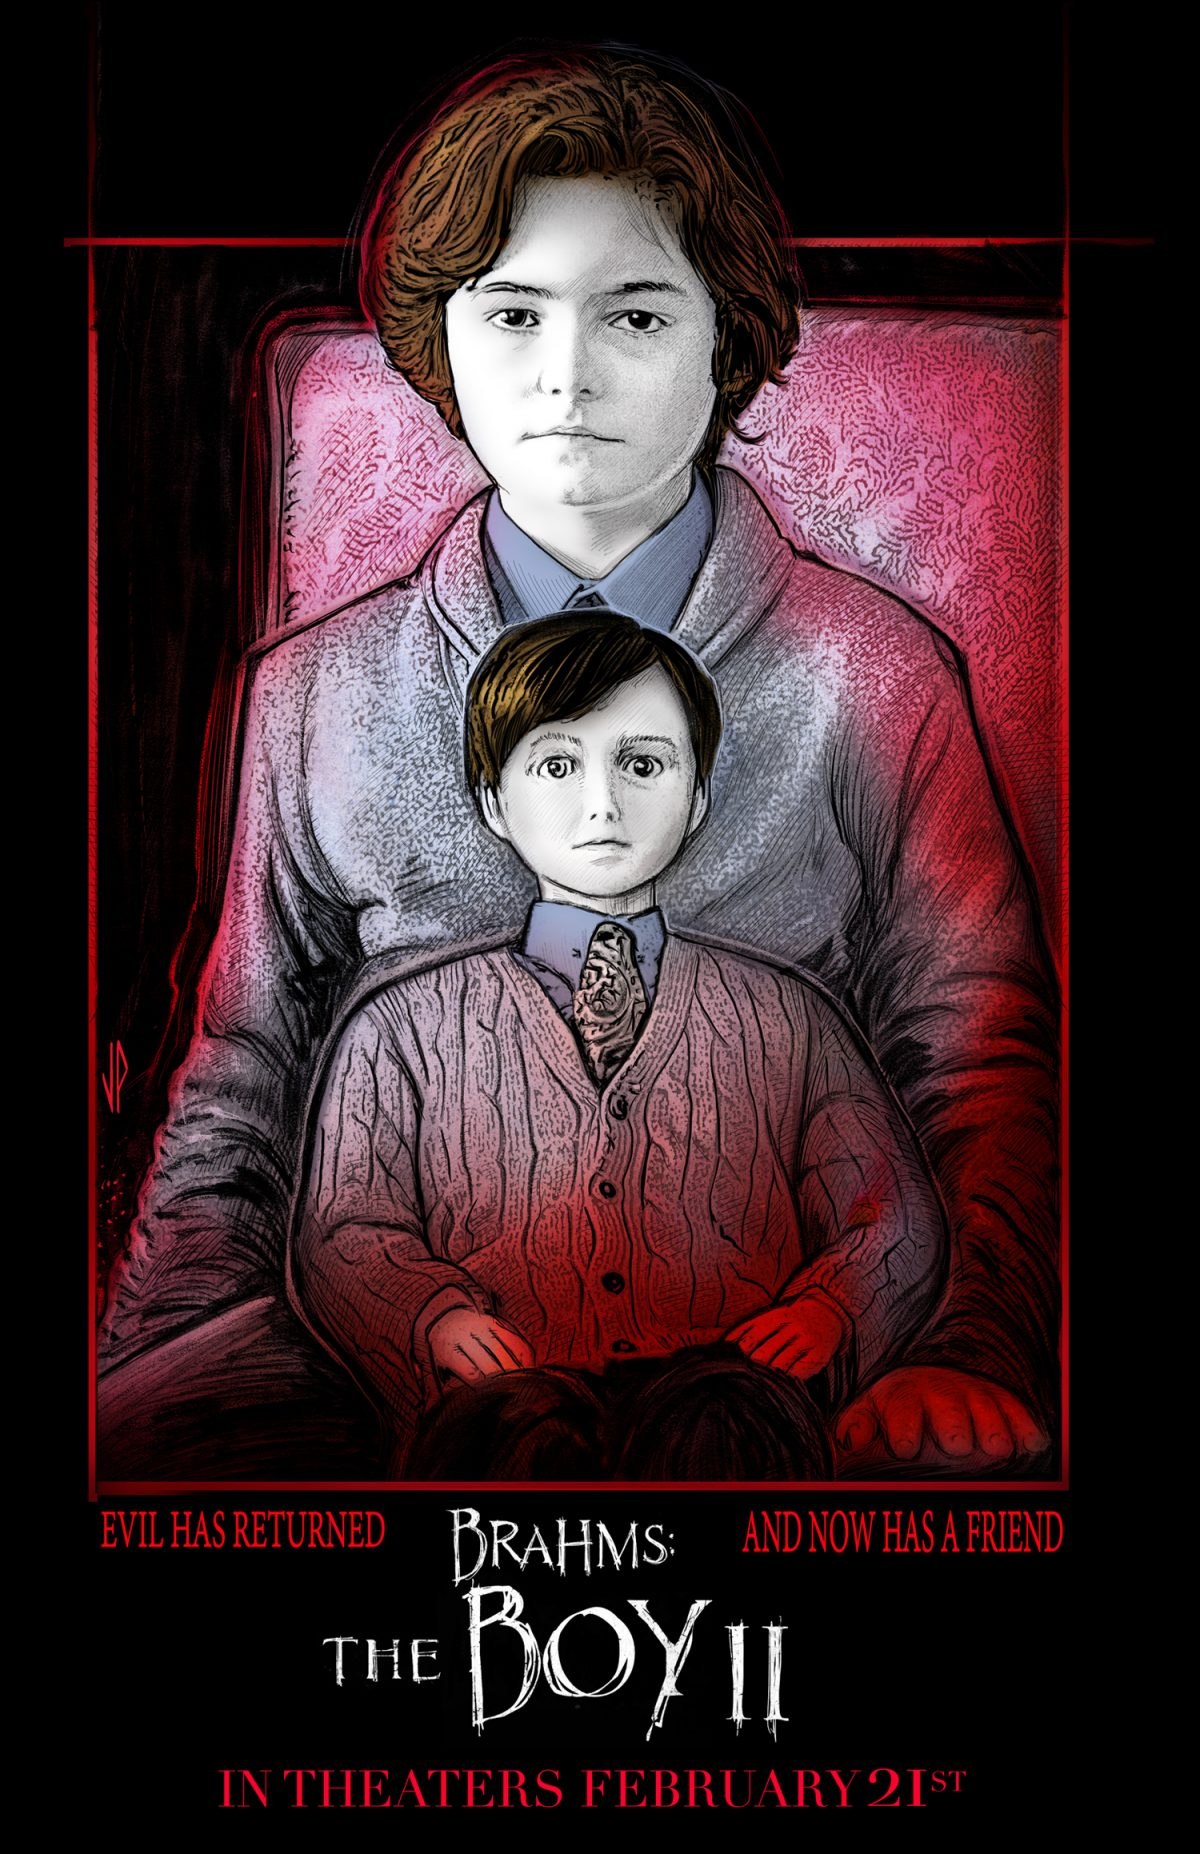 Brahms: The Boy II poster design (red glow version ...